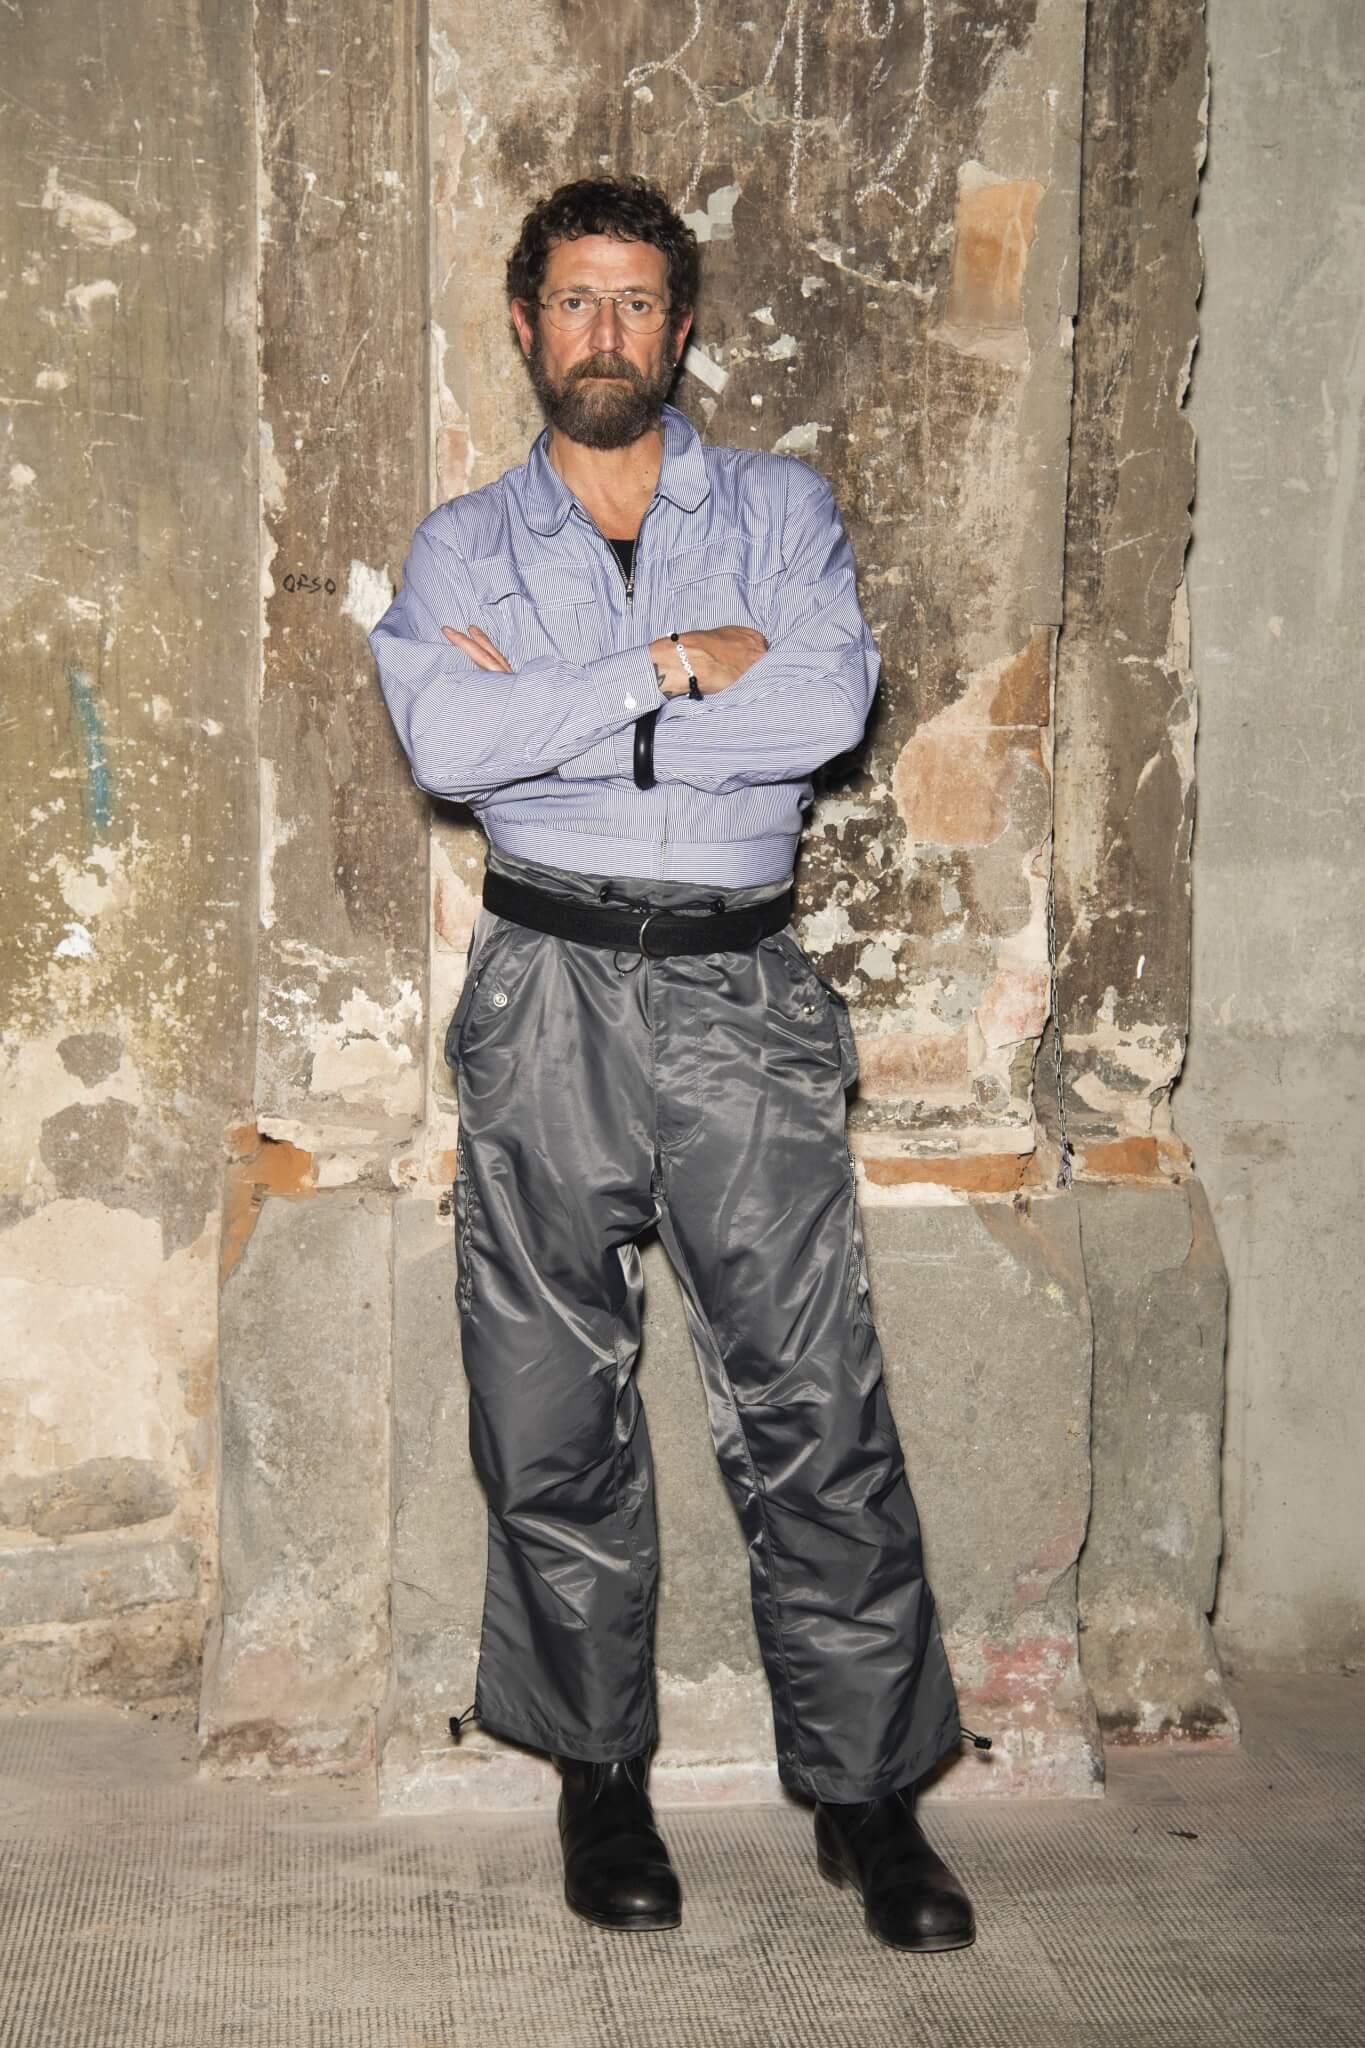 story-stefano-pilati-random-identities-fall-2020-menswear-gq-january-2020-011020